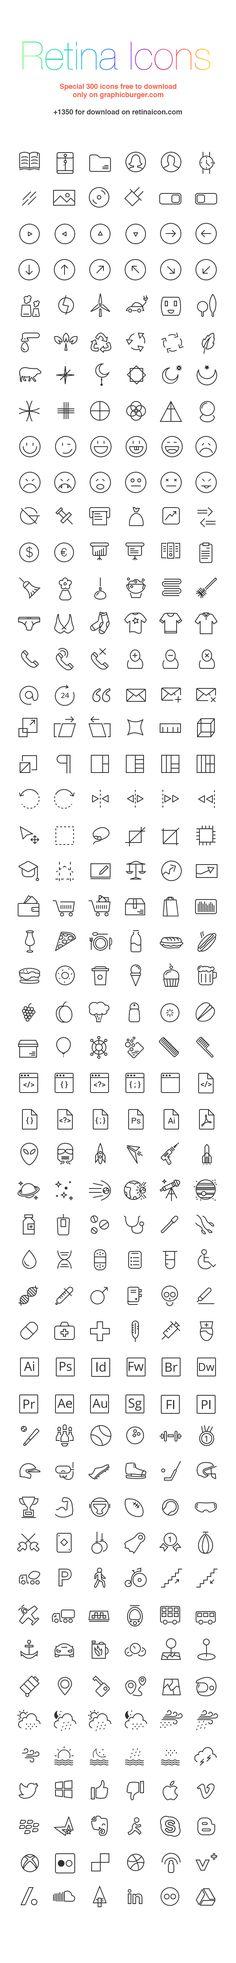 RetinaIcon: 300 Free Icons | GraphicBurger